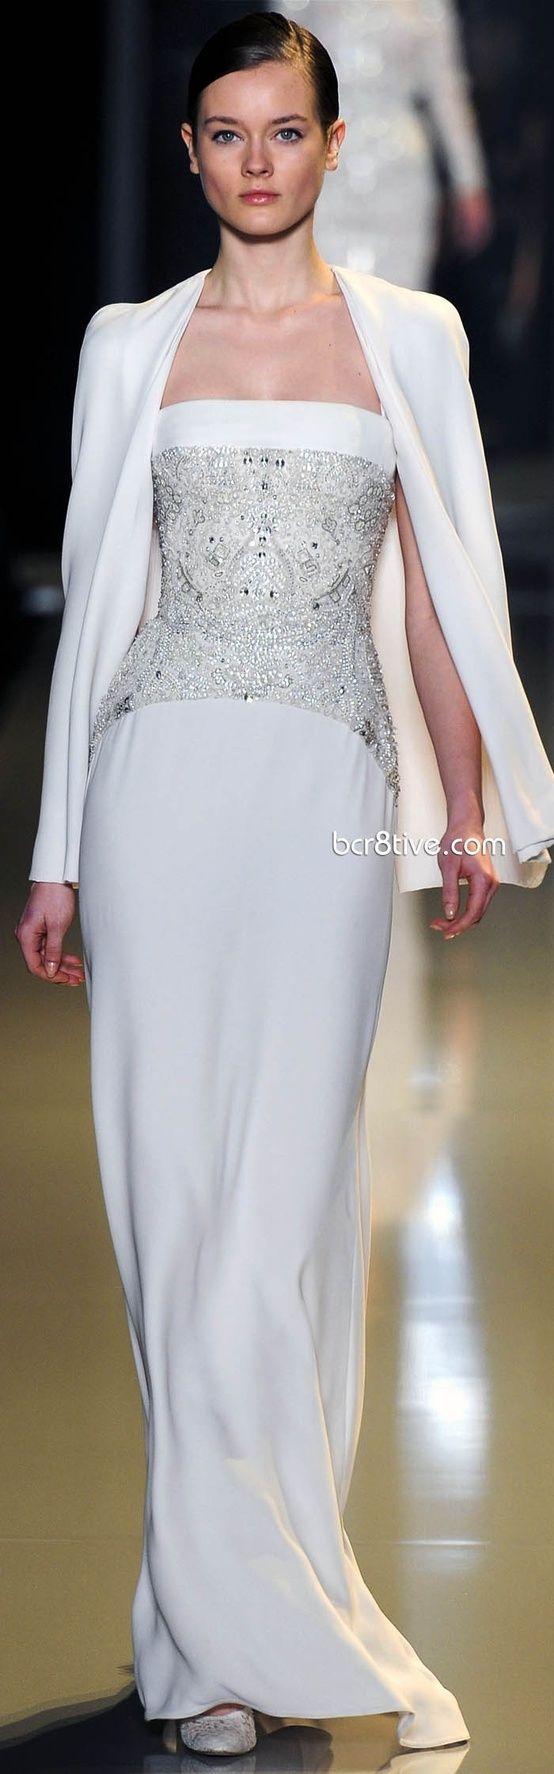 618 best images about short wedding dresses reception for Maxi dress for wedding reception